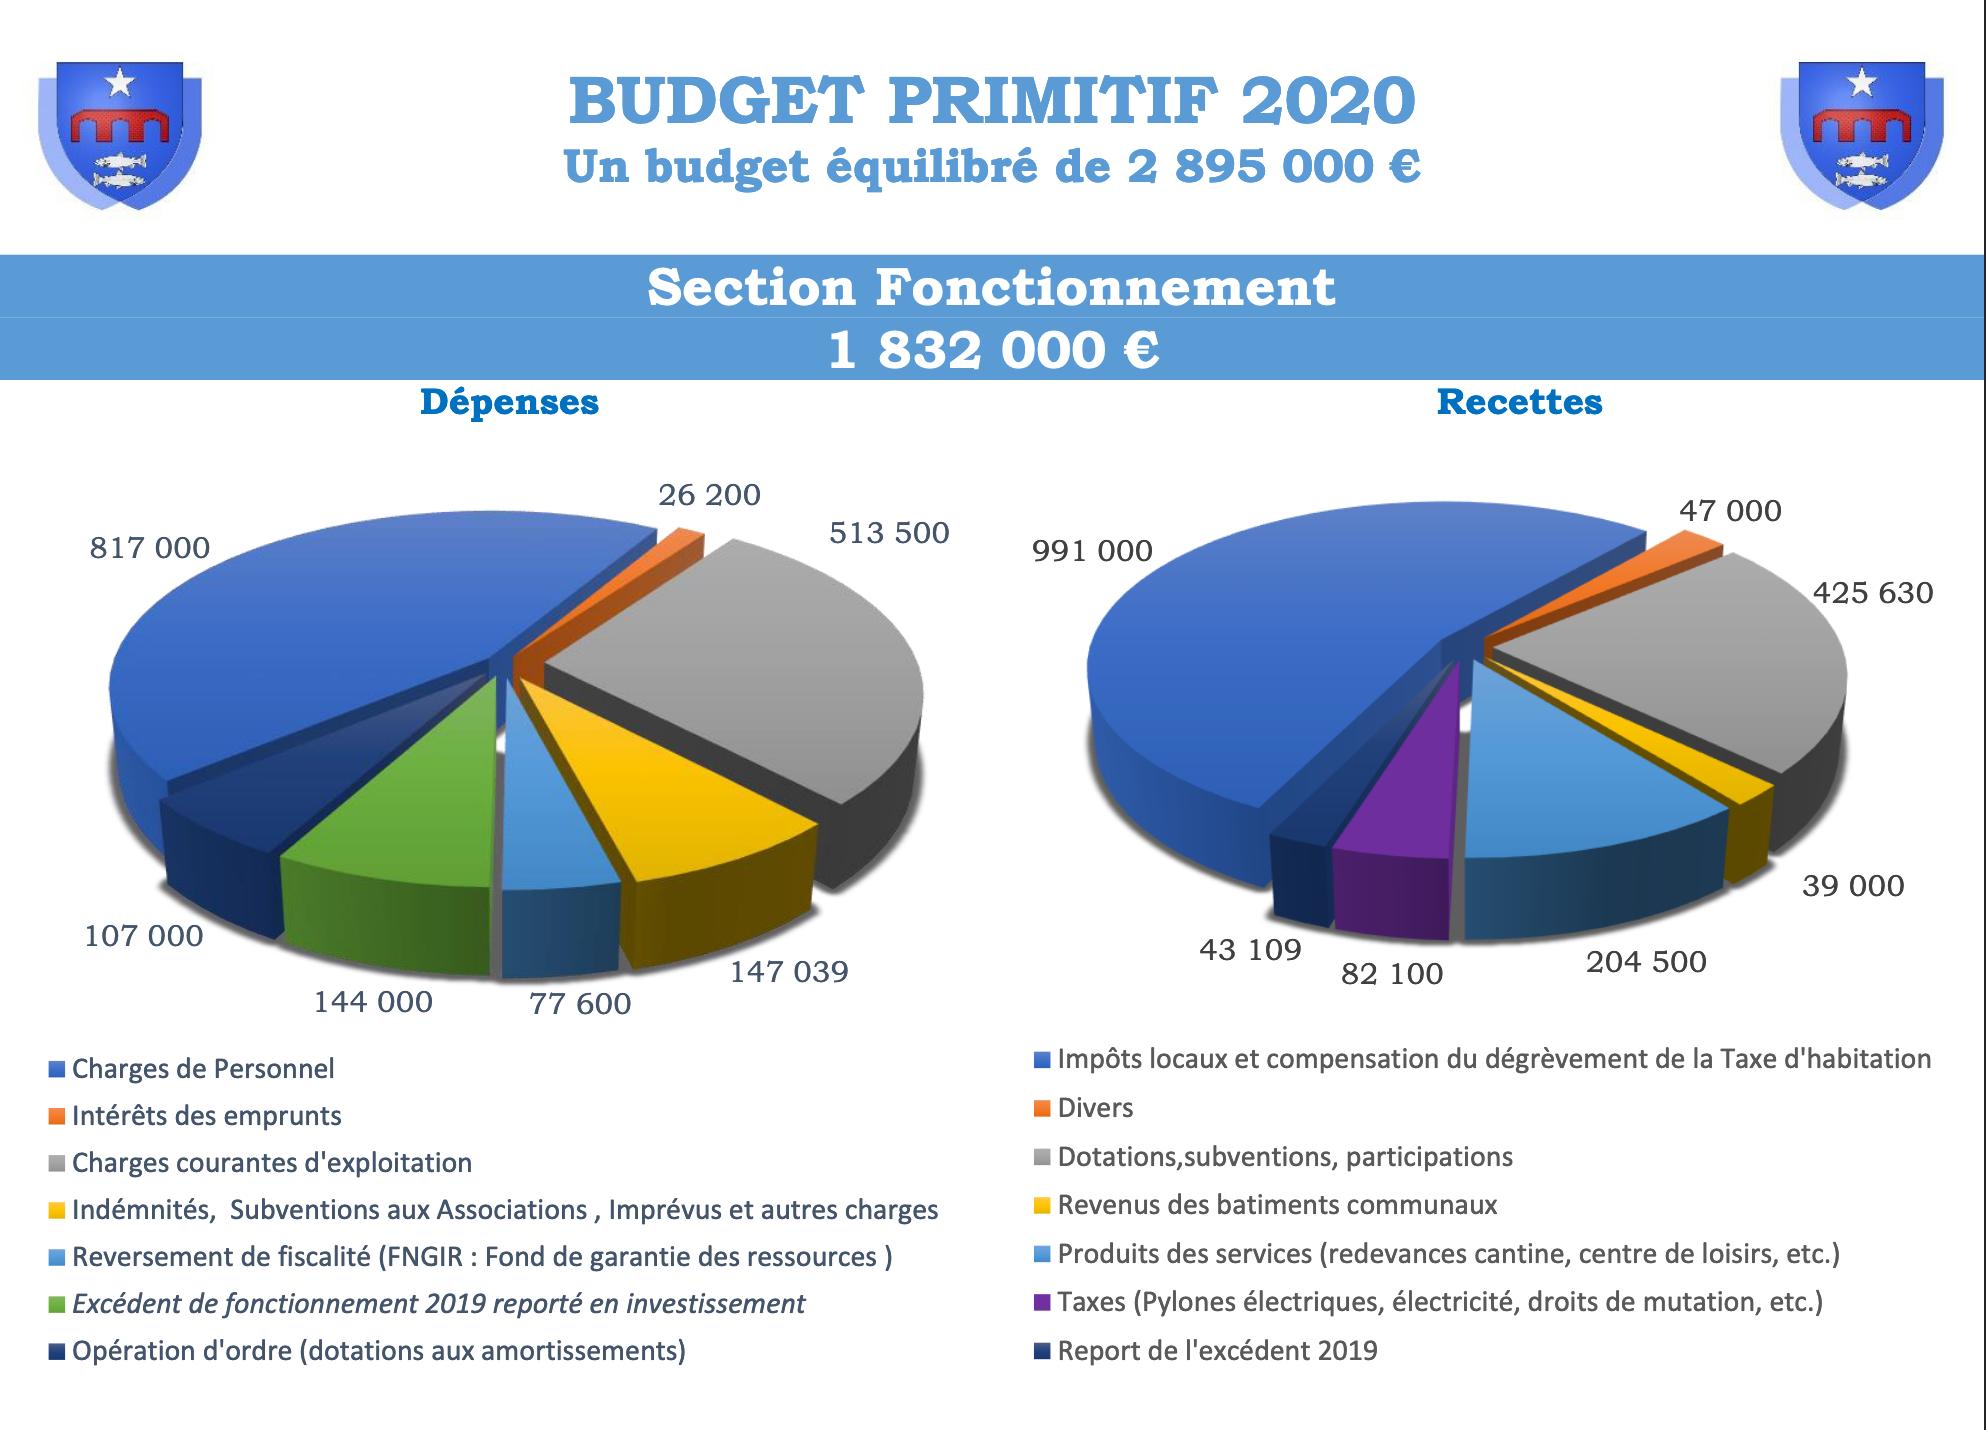 Visuel du budget primitif 2020